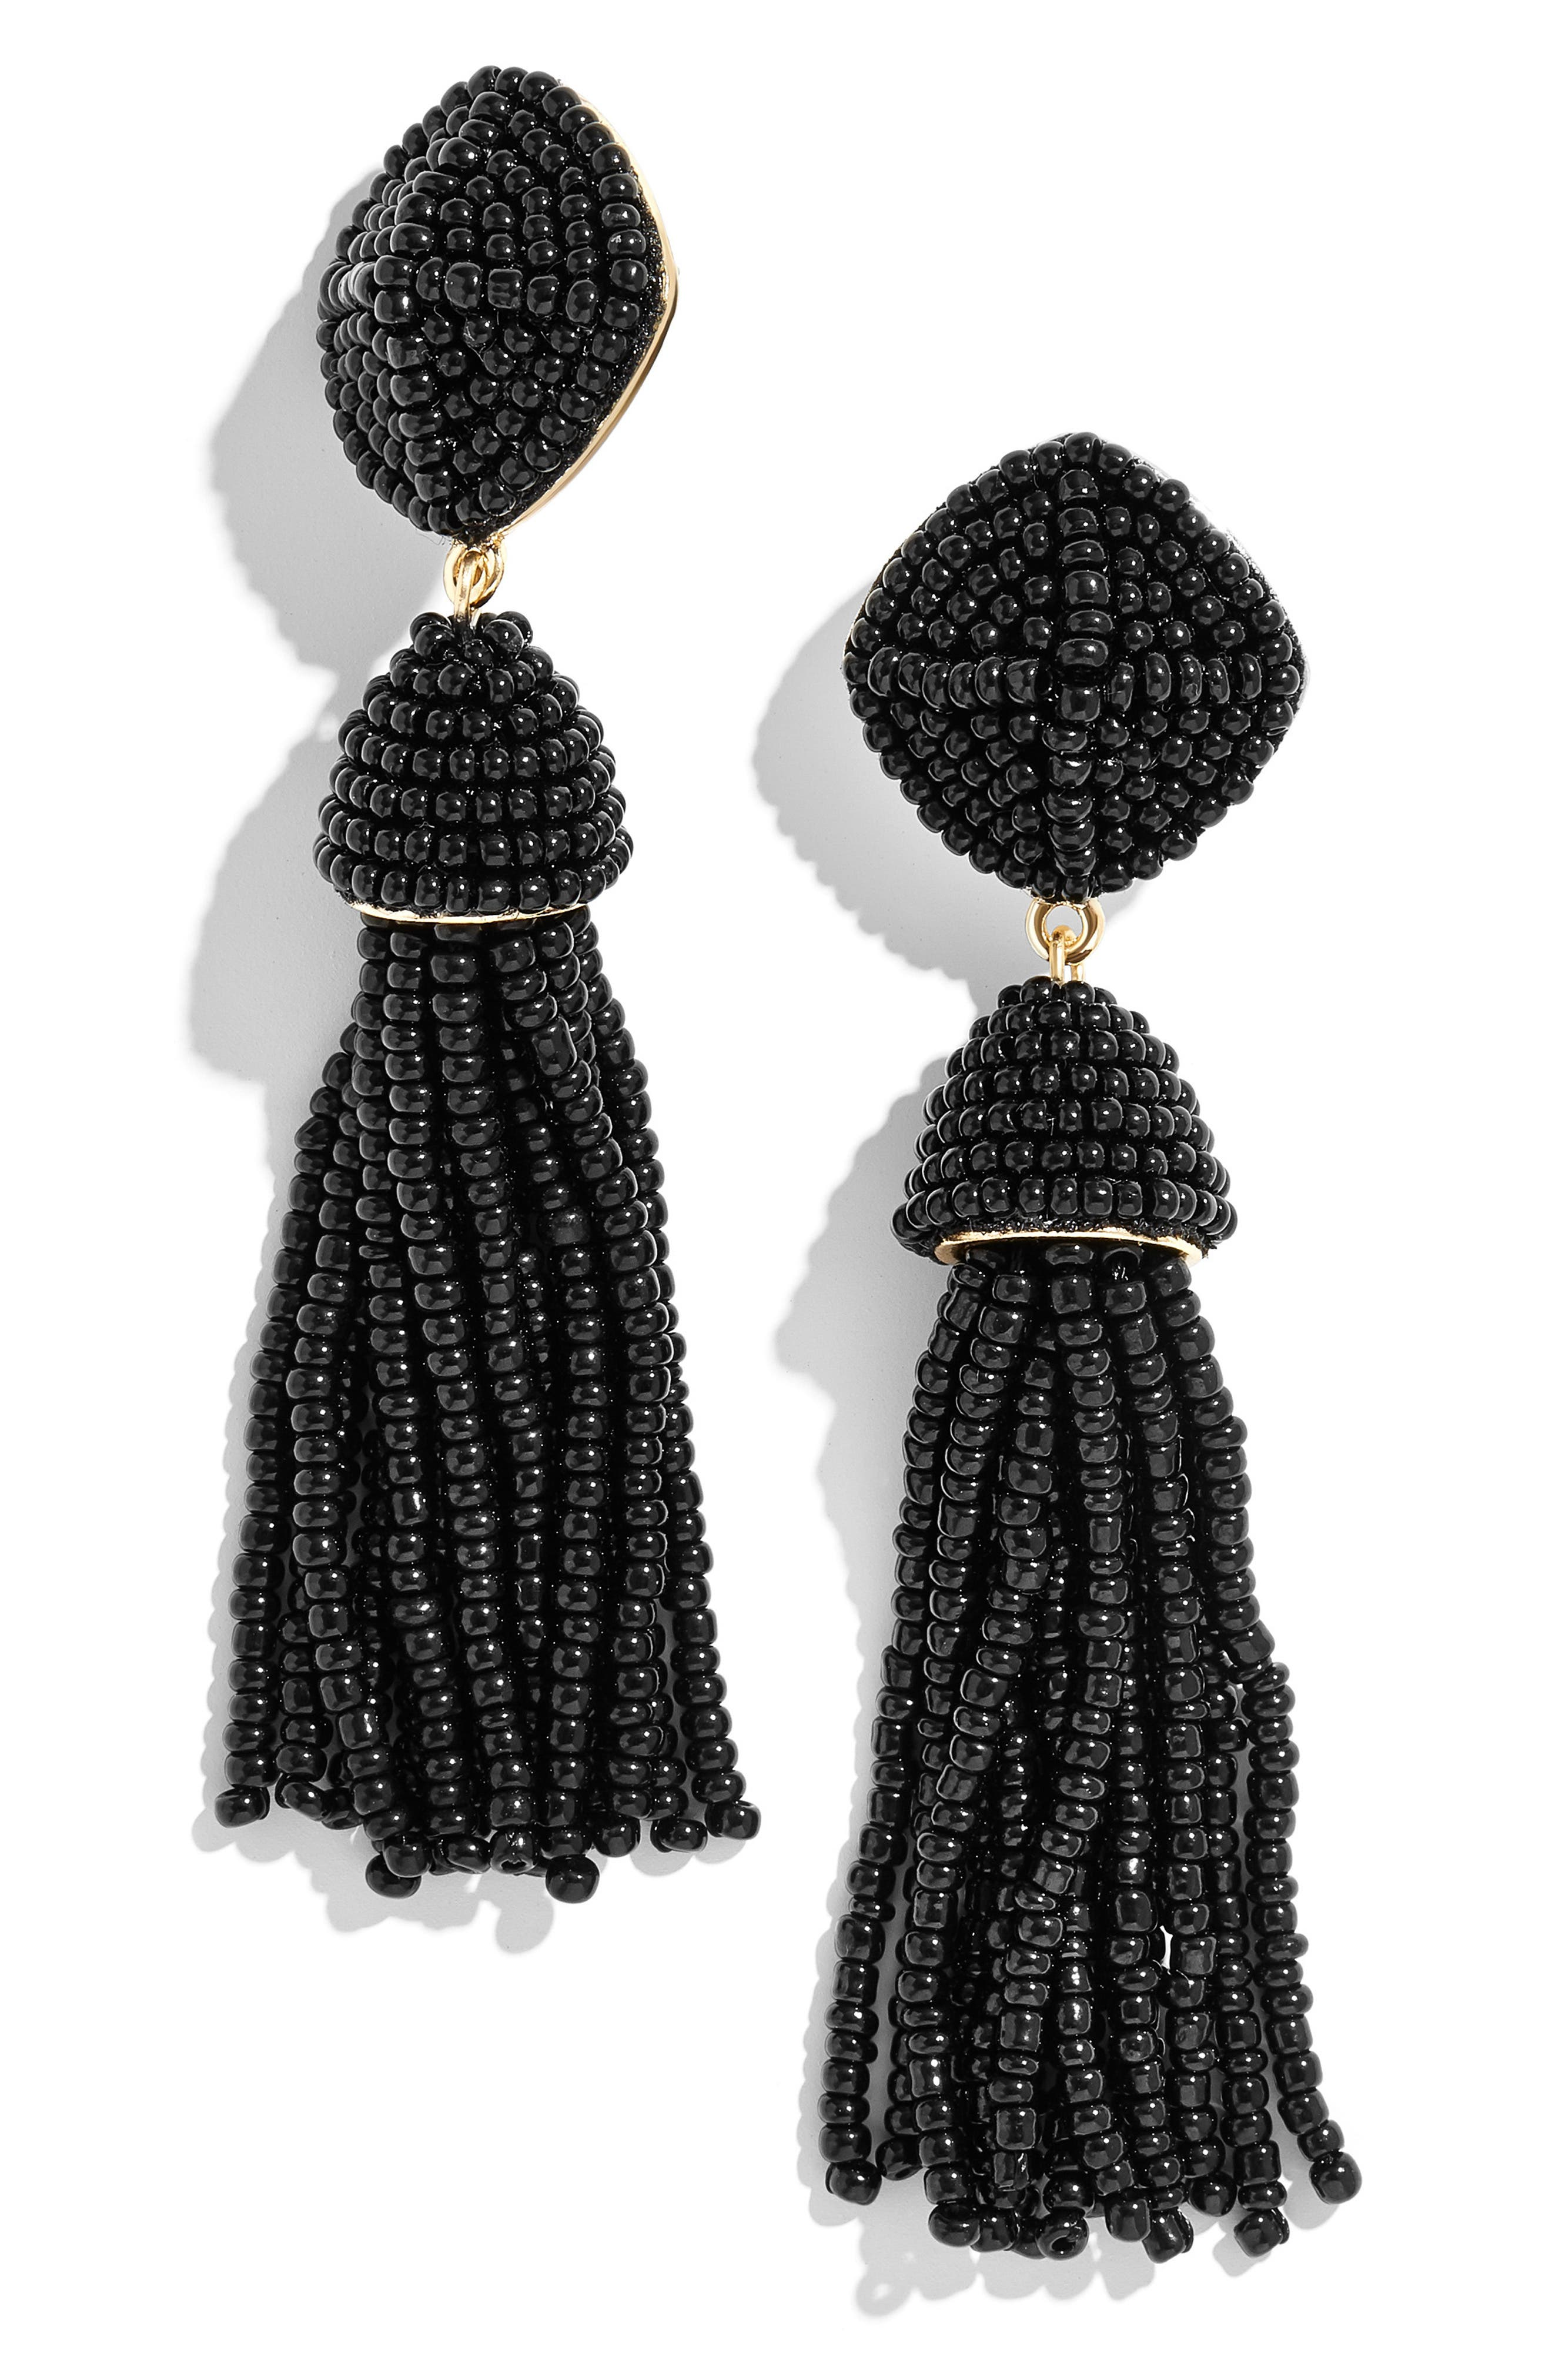 BAUBLEBAR, Rubina Beaded Tassel Earrings, Main thumbnail 1, color, BLACK